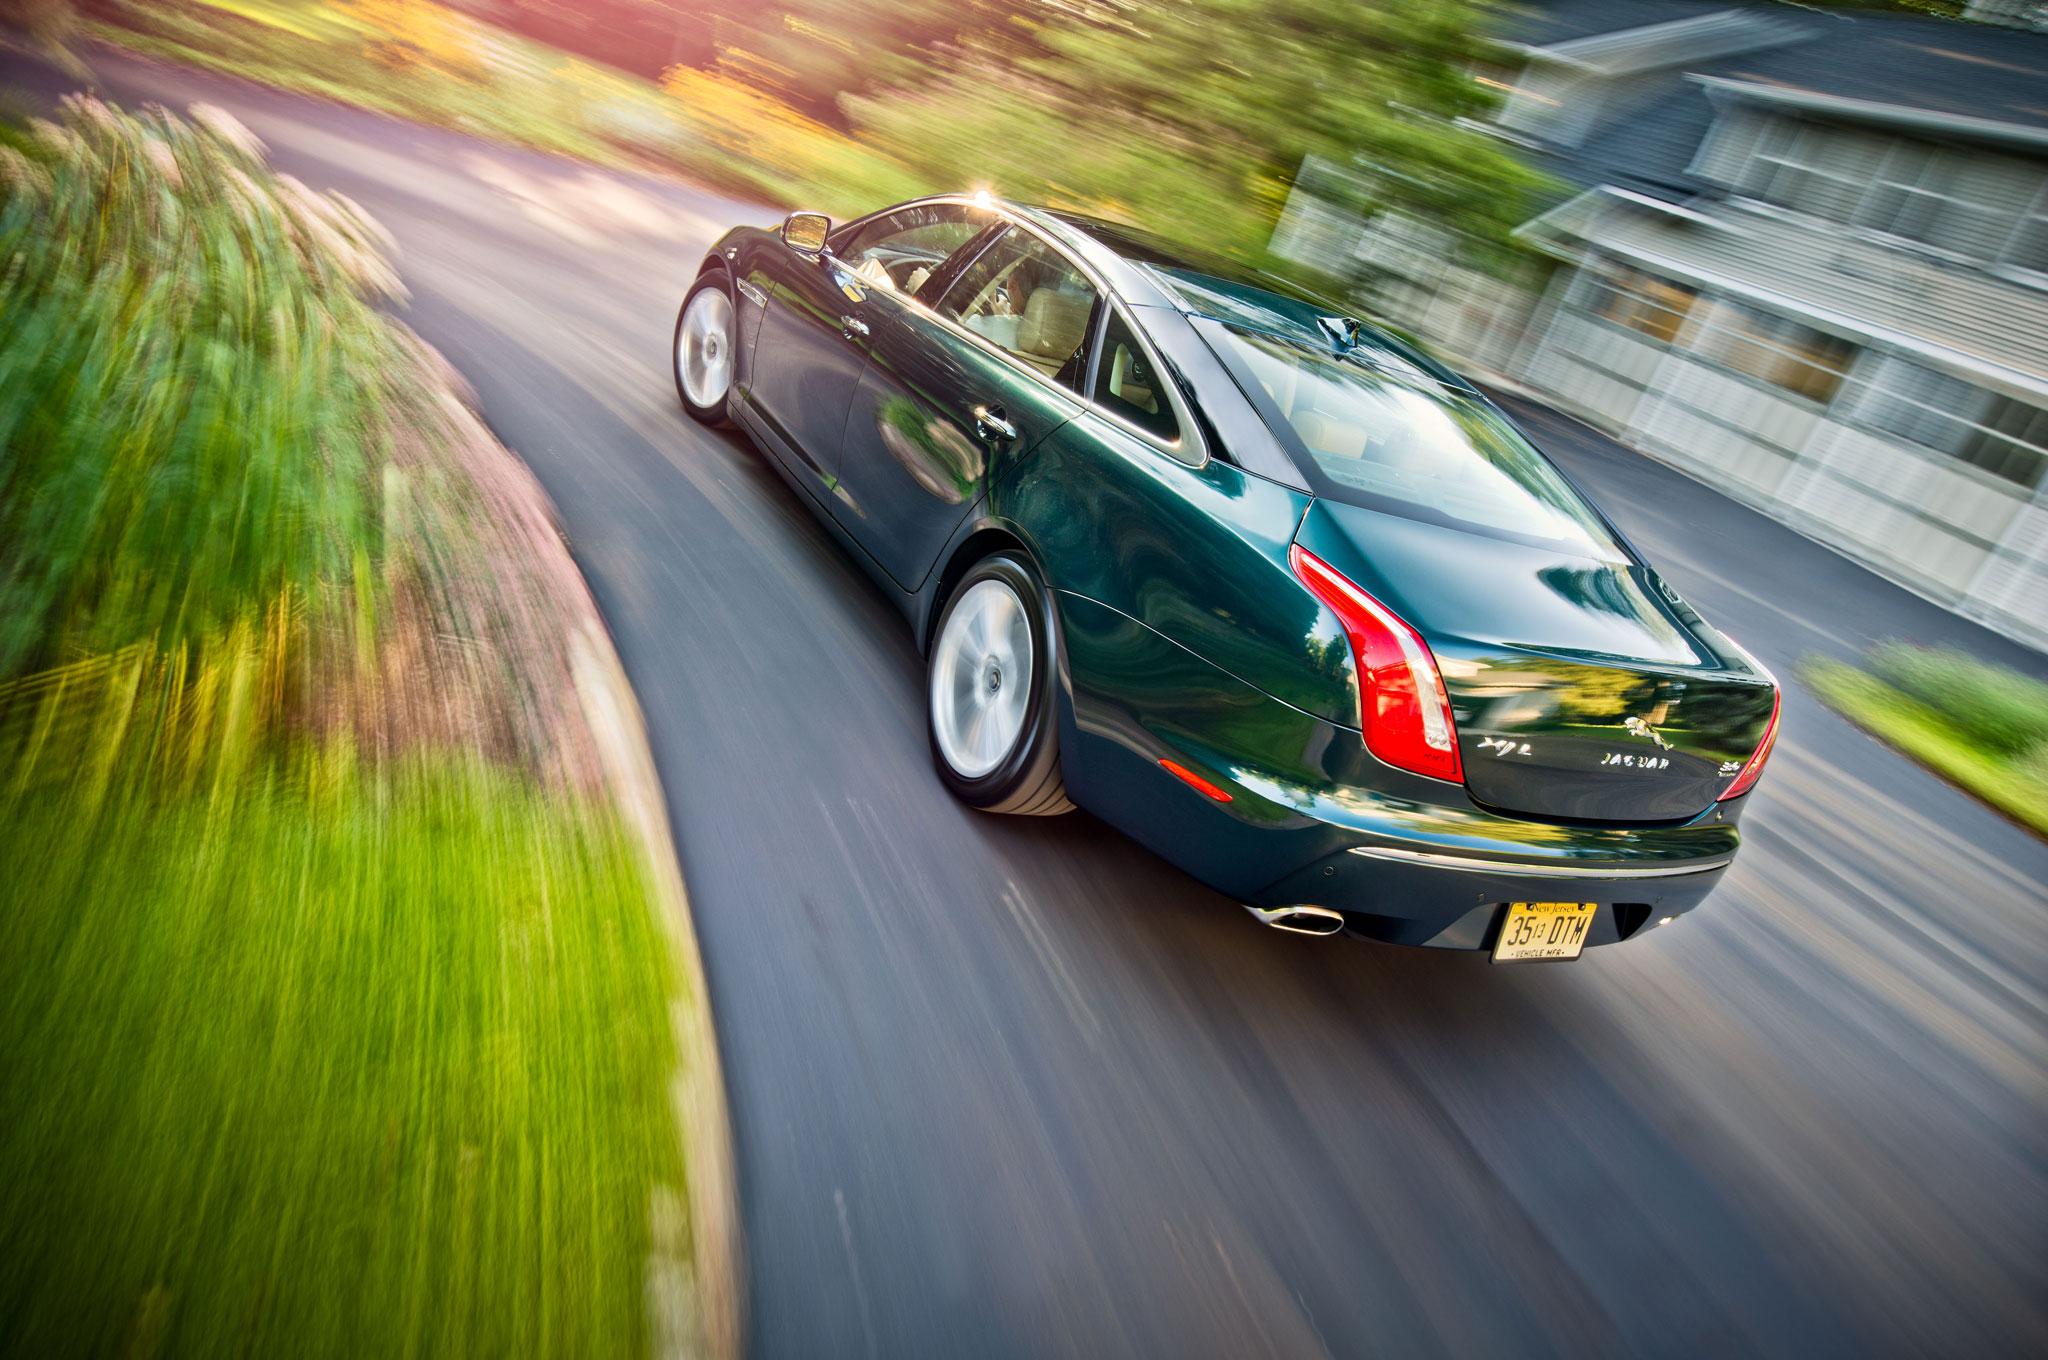 2013 Jaguar Xjl Portfolio Awd High Style In The Backseat